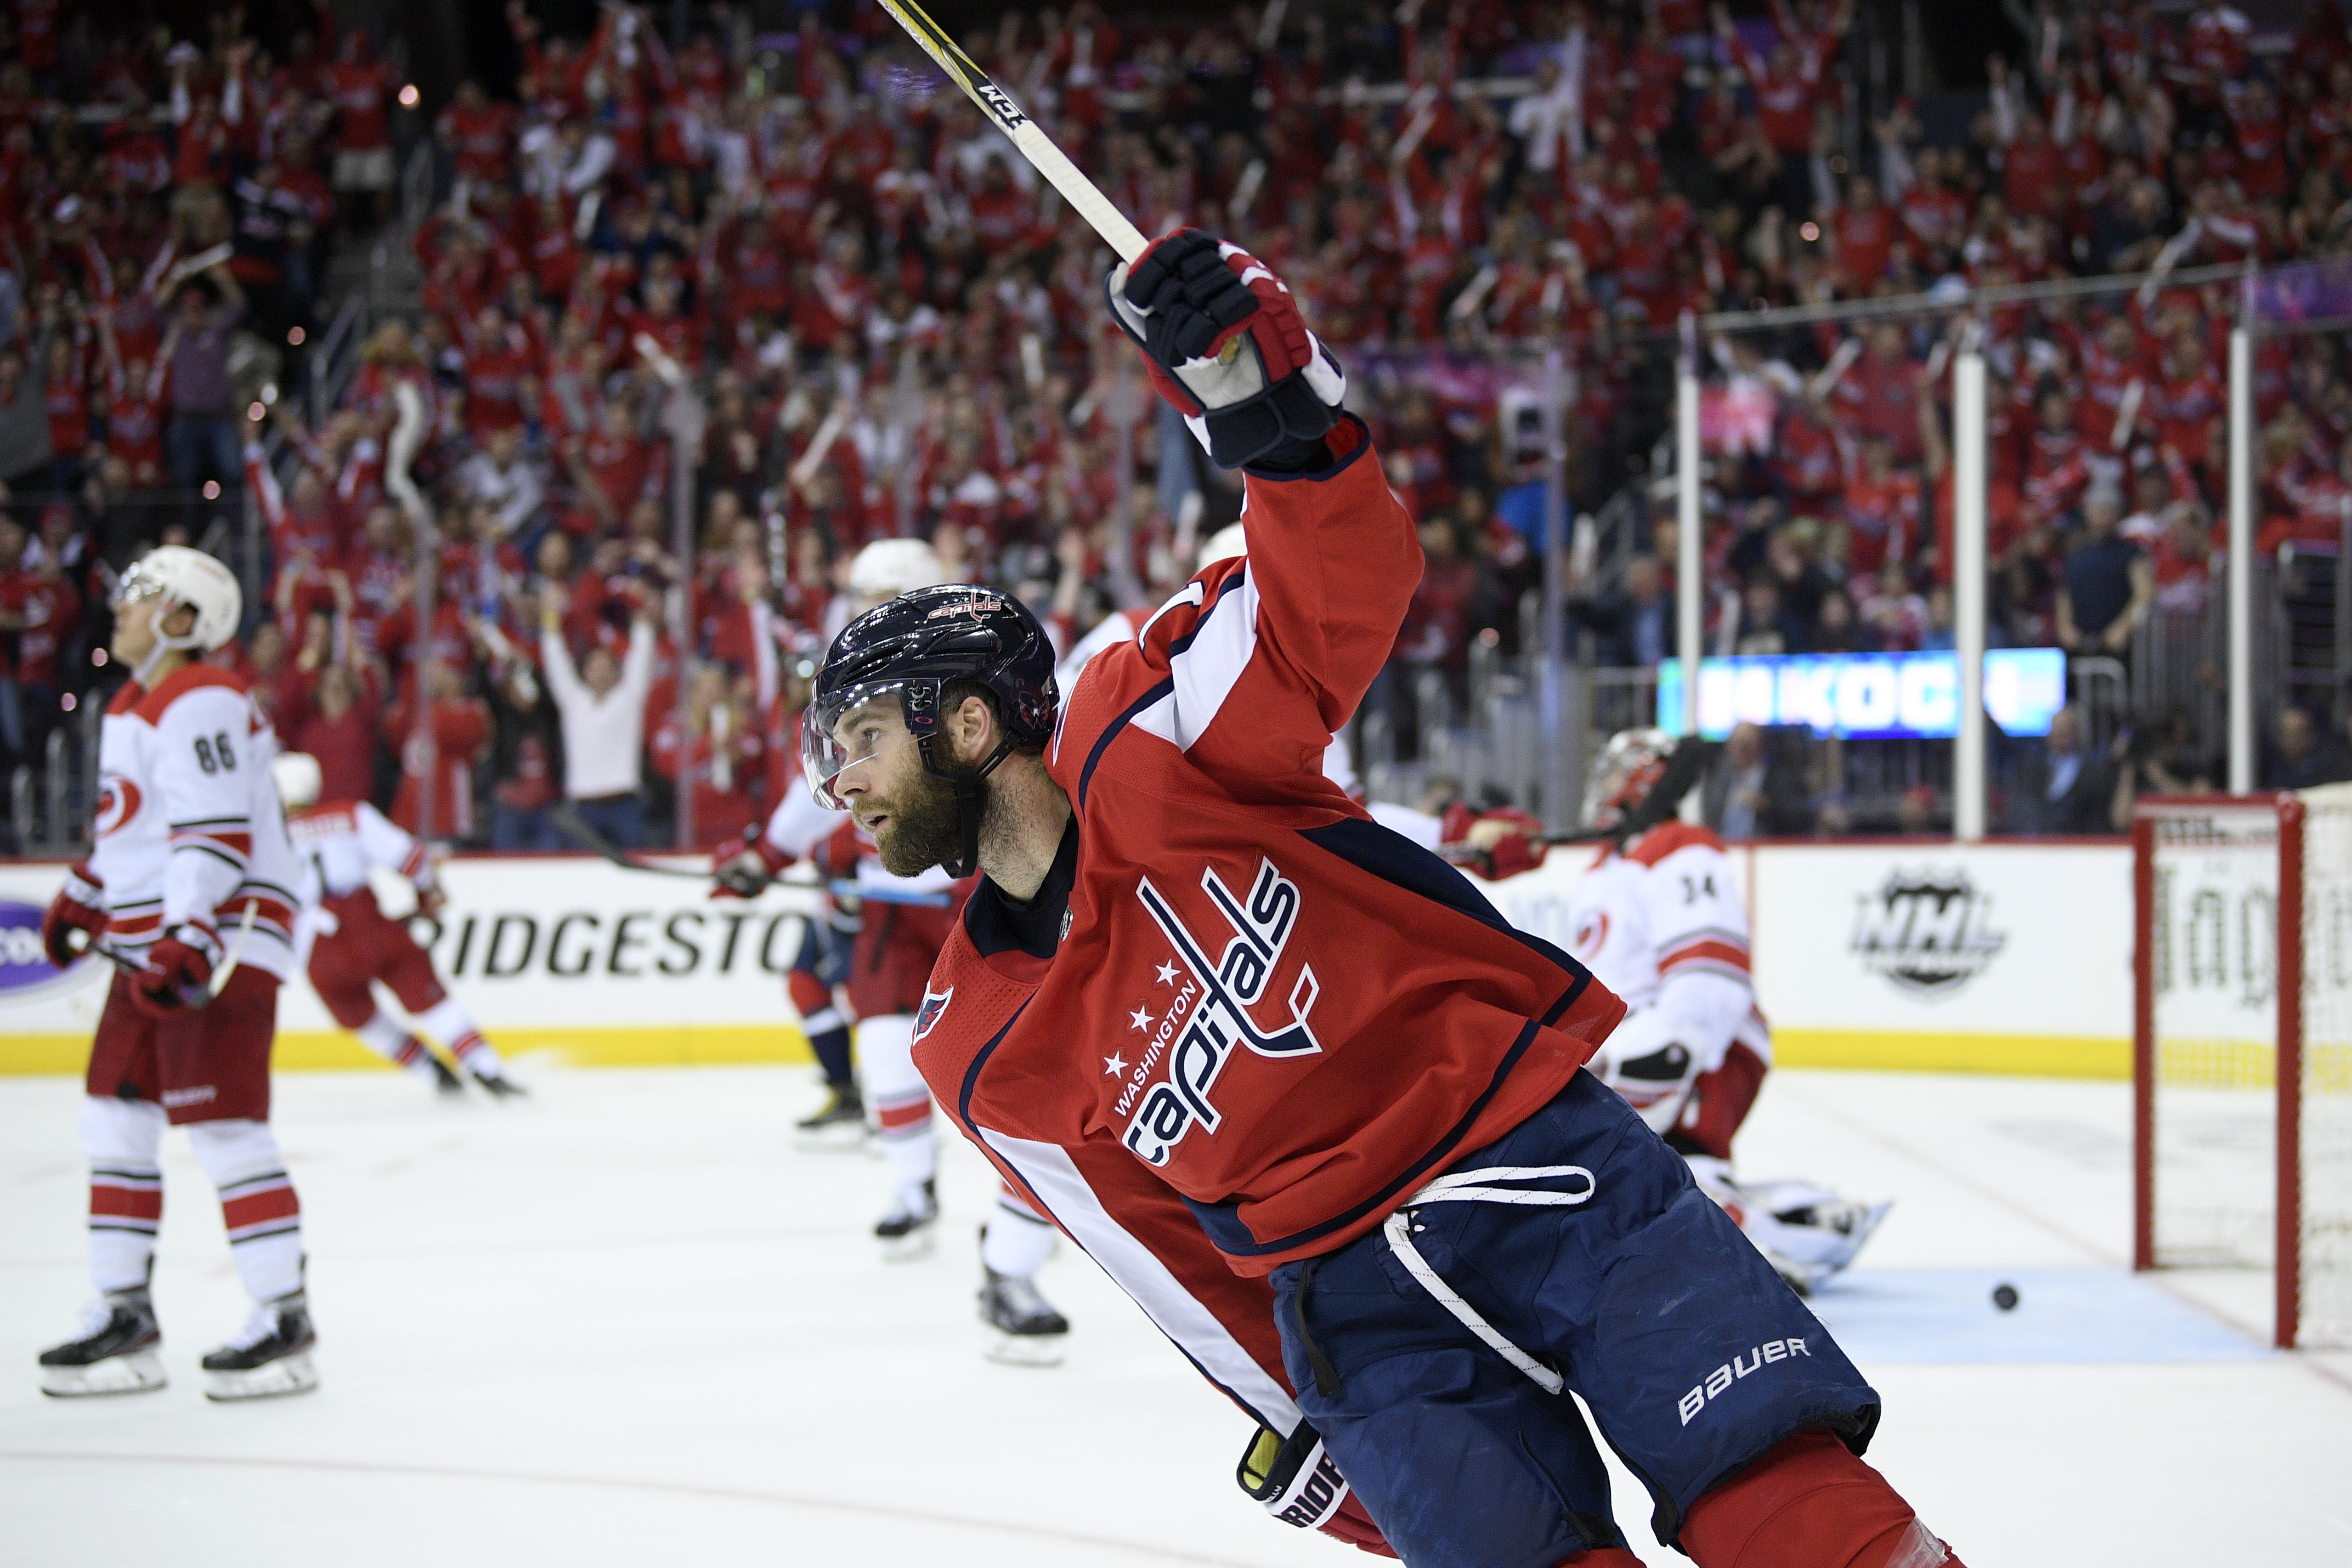 Capitals rediscover elite form, drub Hurricanes to take series lead